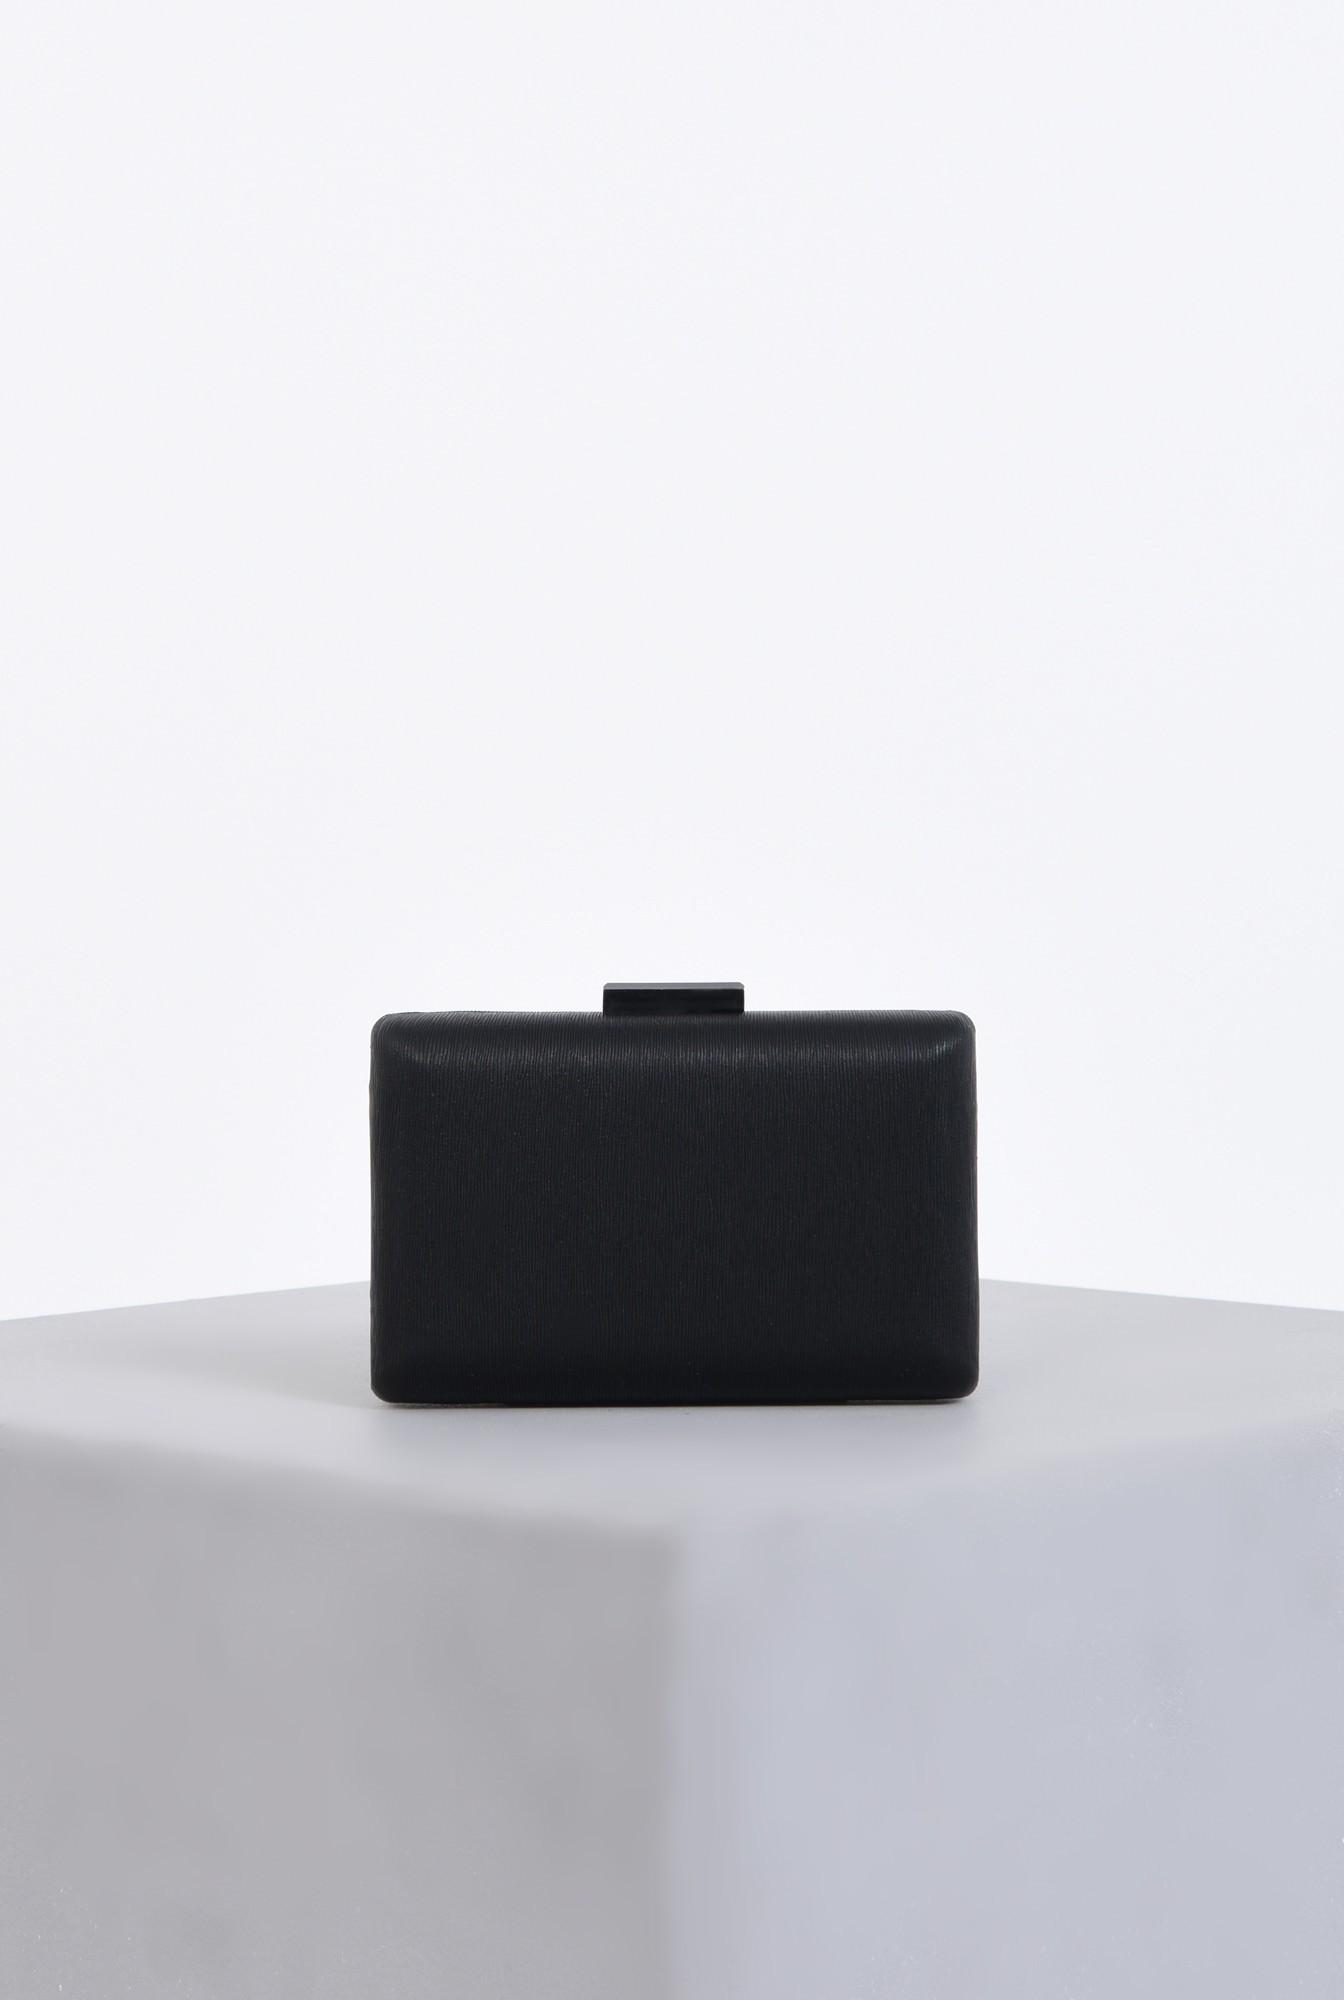 0 - plic dama, mini size, lant detasabil